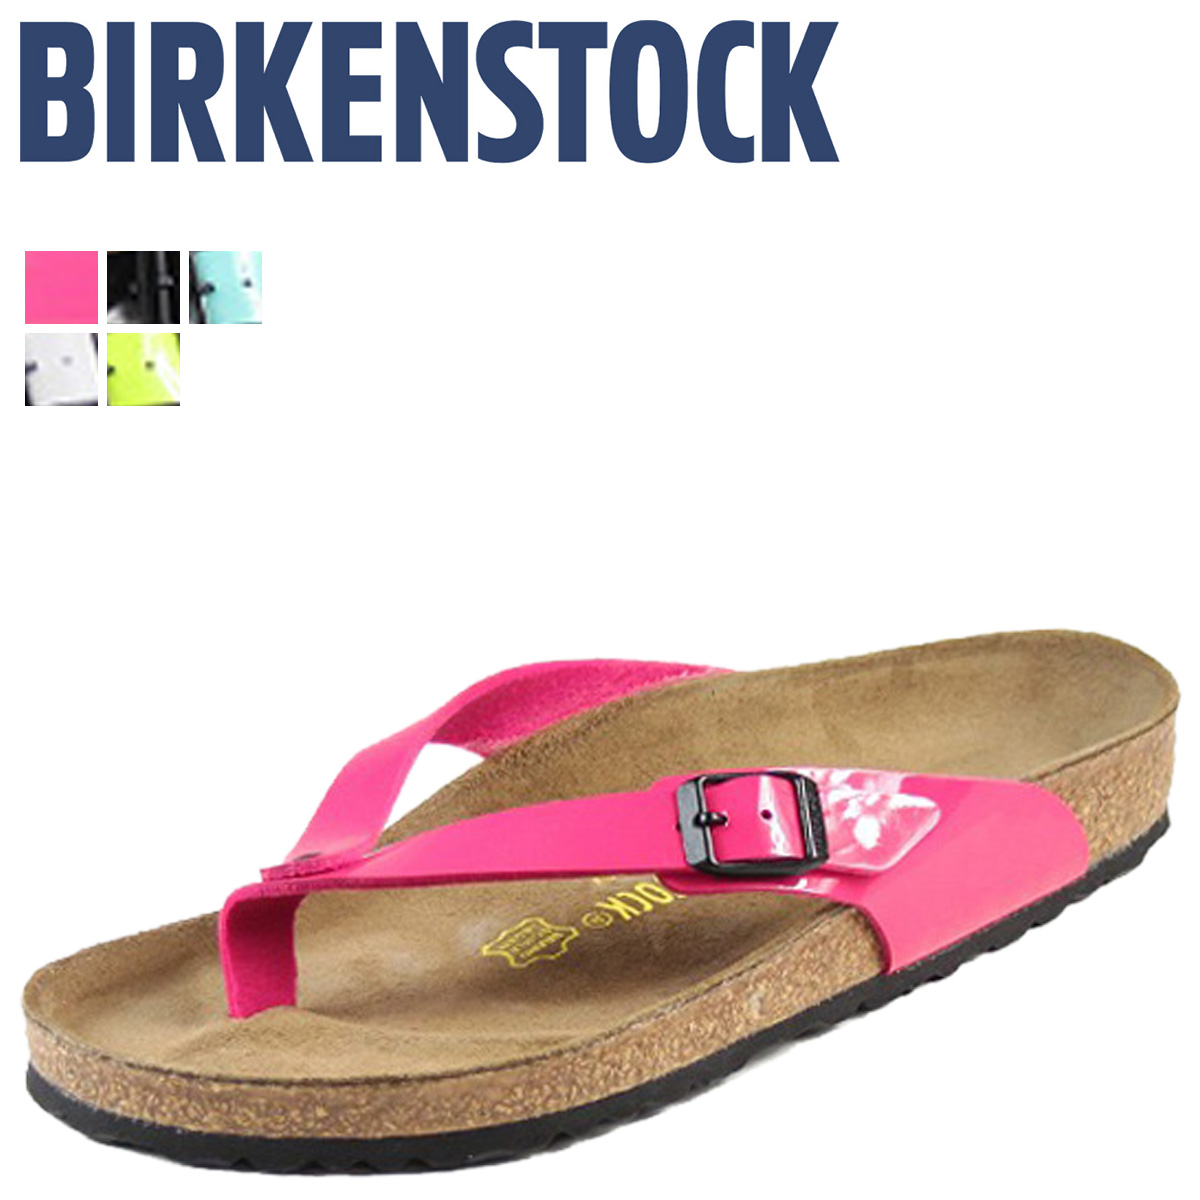 f6254dbbc8c68f Birkenstock-BIRKENSTOCK Adria ADRIA  normal width synthetic leather